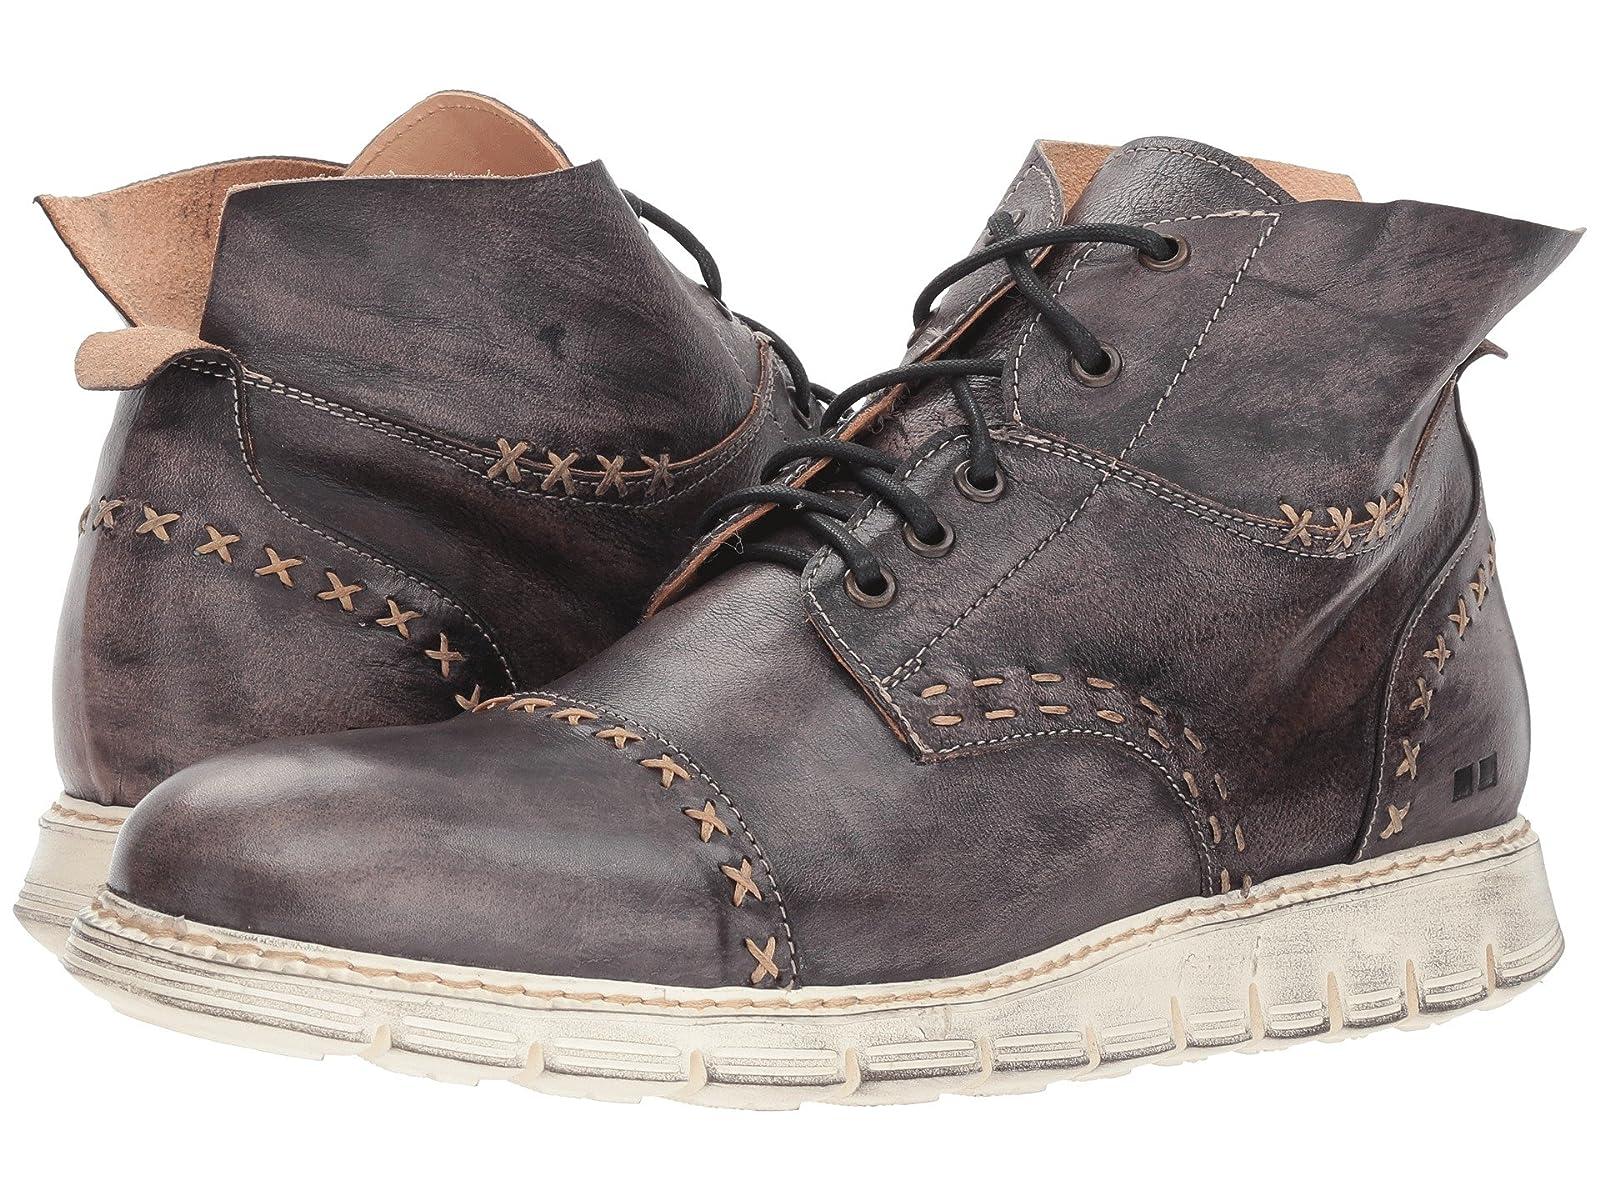 Bed Stu BowerySelling fashionable and eye-catching shoes